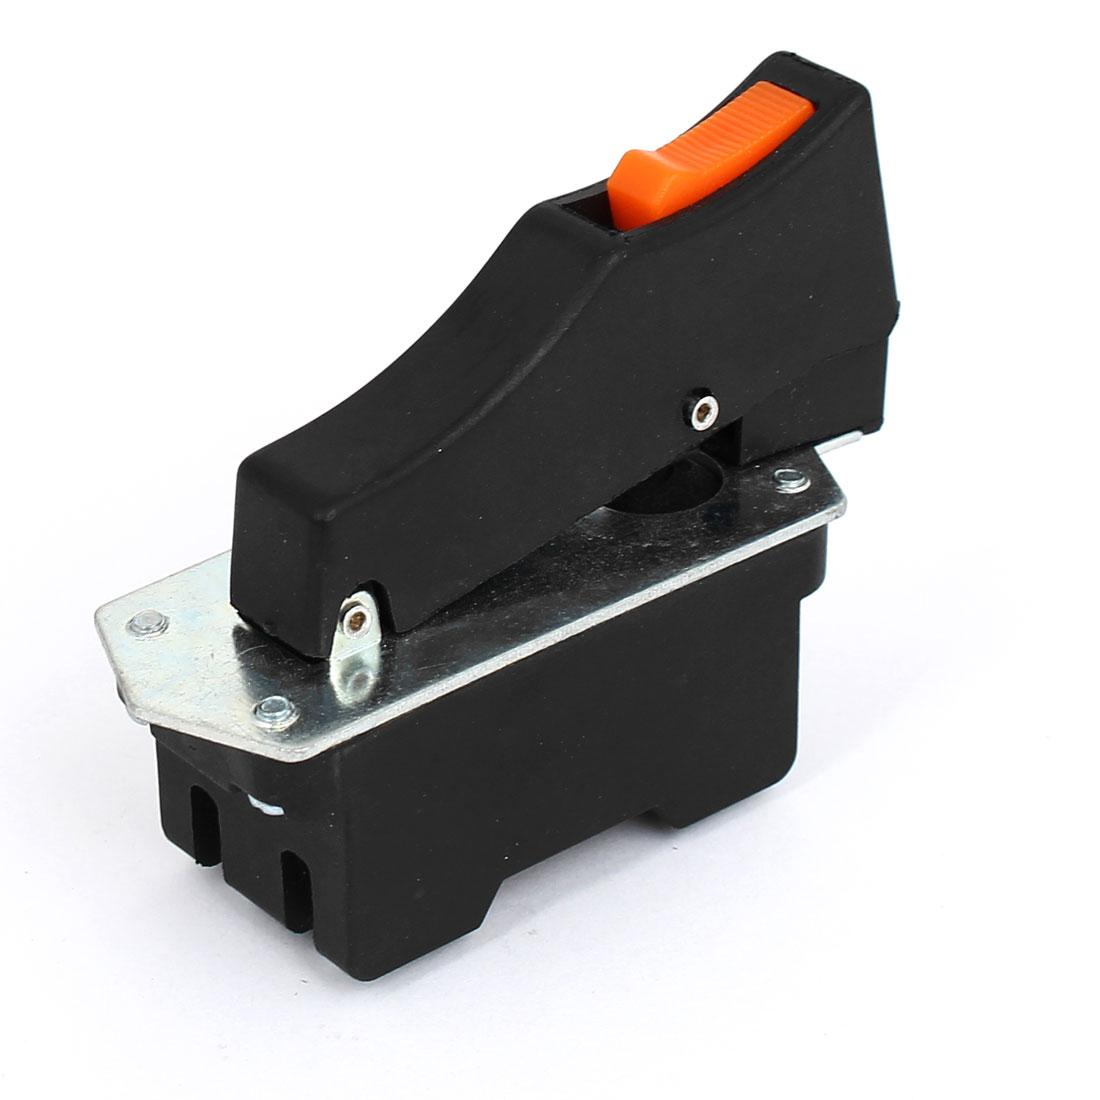 AC 250V 10A 5E4 DPST 2 NO Trigger Switch for Bosch 355 Cutting Machine